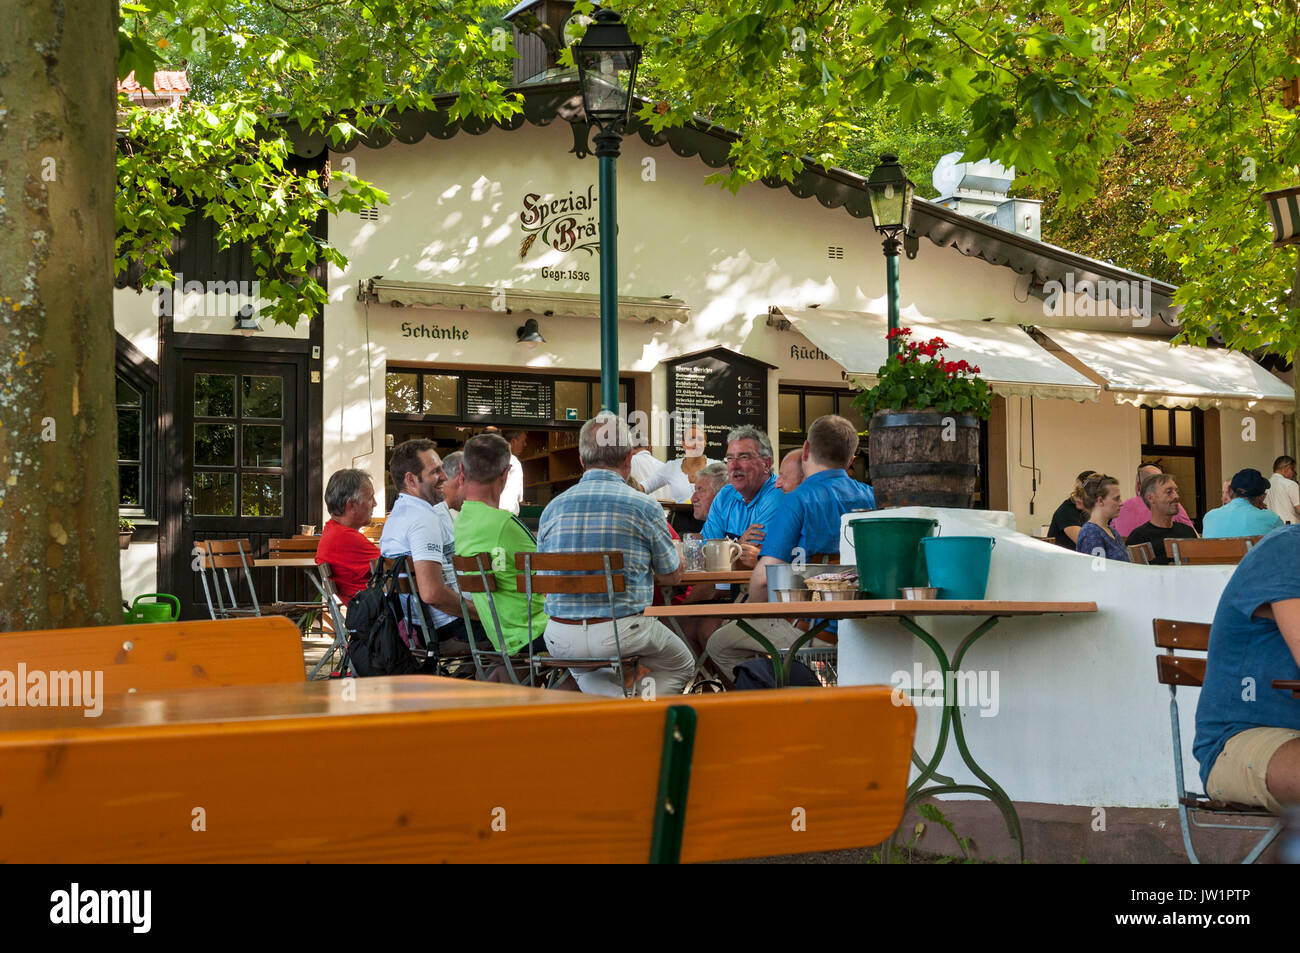 Spezial Keller Beer Garden In Bamberg Franconia Bavaria Germany Stock Photo Alamy